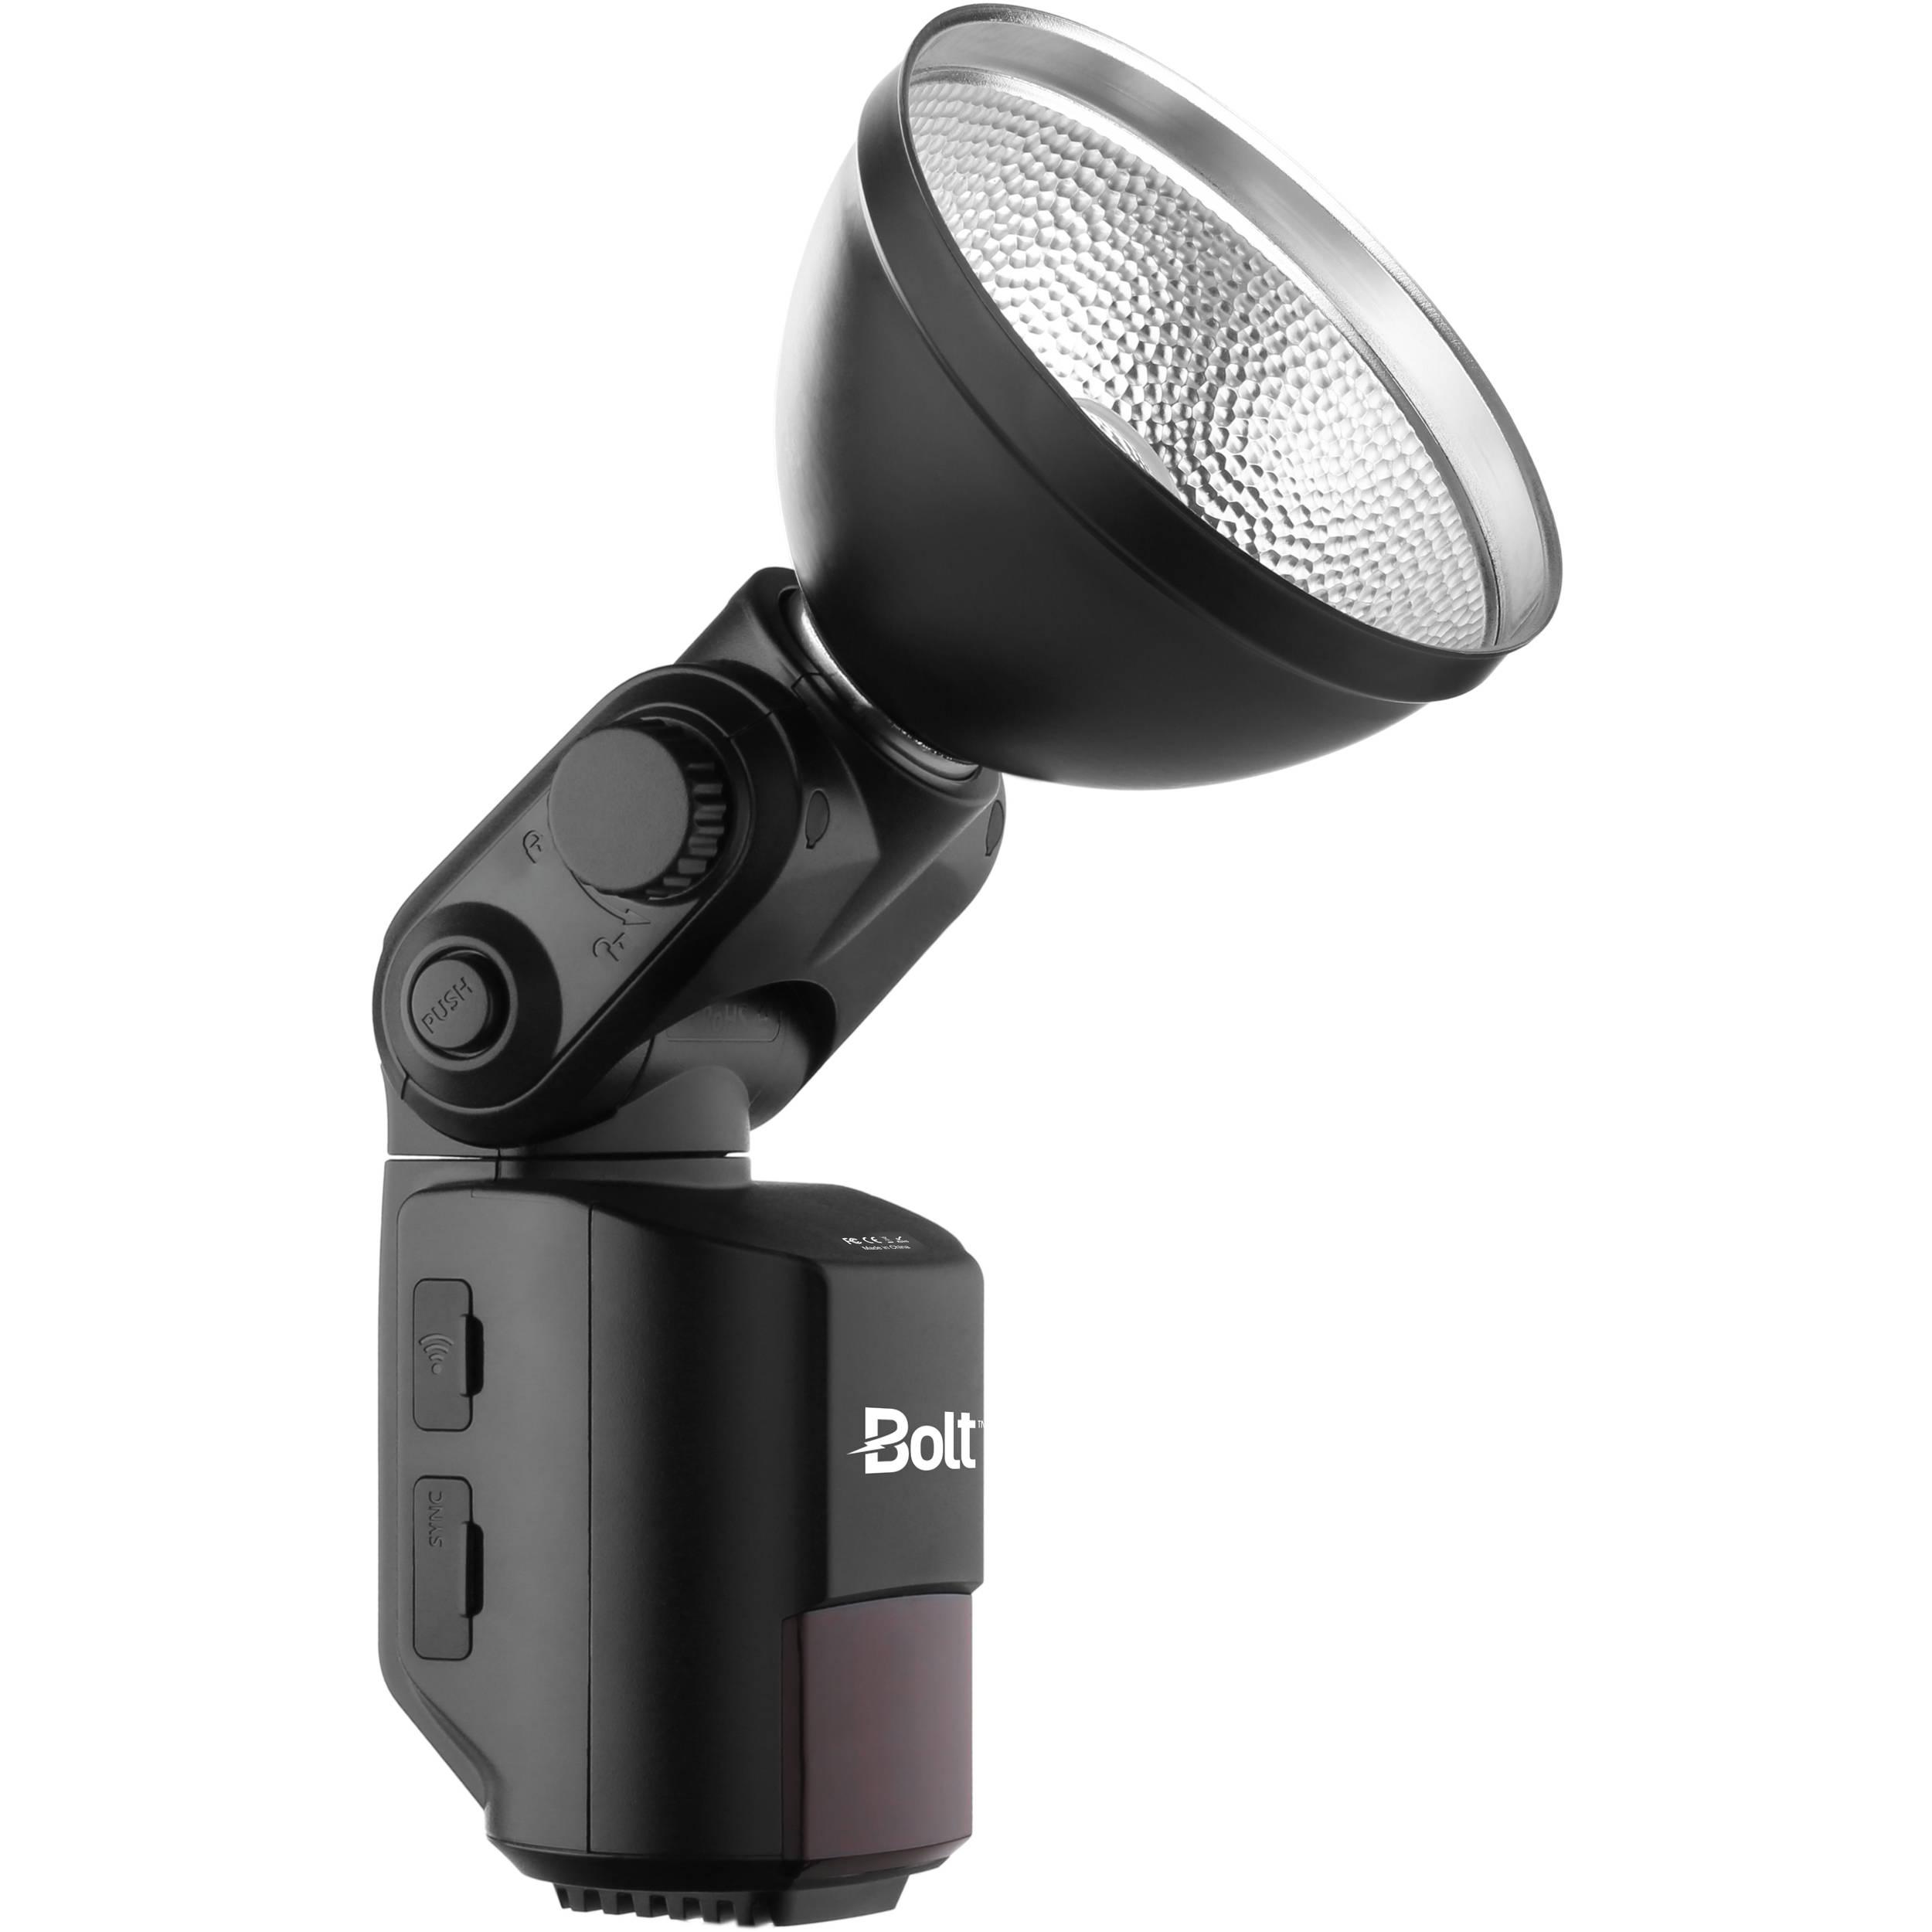 Bolt VB-22 Bare-Bulb Flash  sc 1 st  Bu0026H & Bolt VB-22 Bare-Bulb Flash VB-22 Bu0026H Photo Video azcodes.com